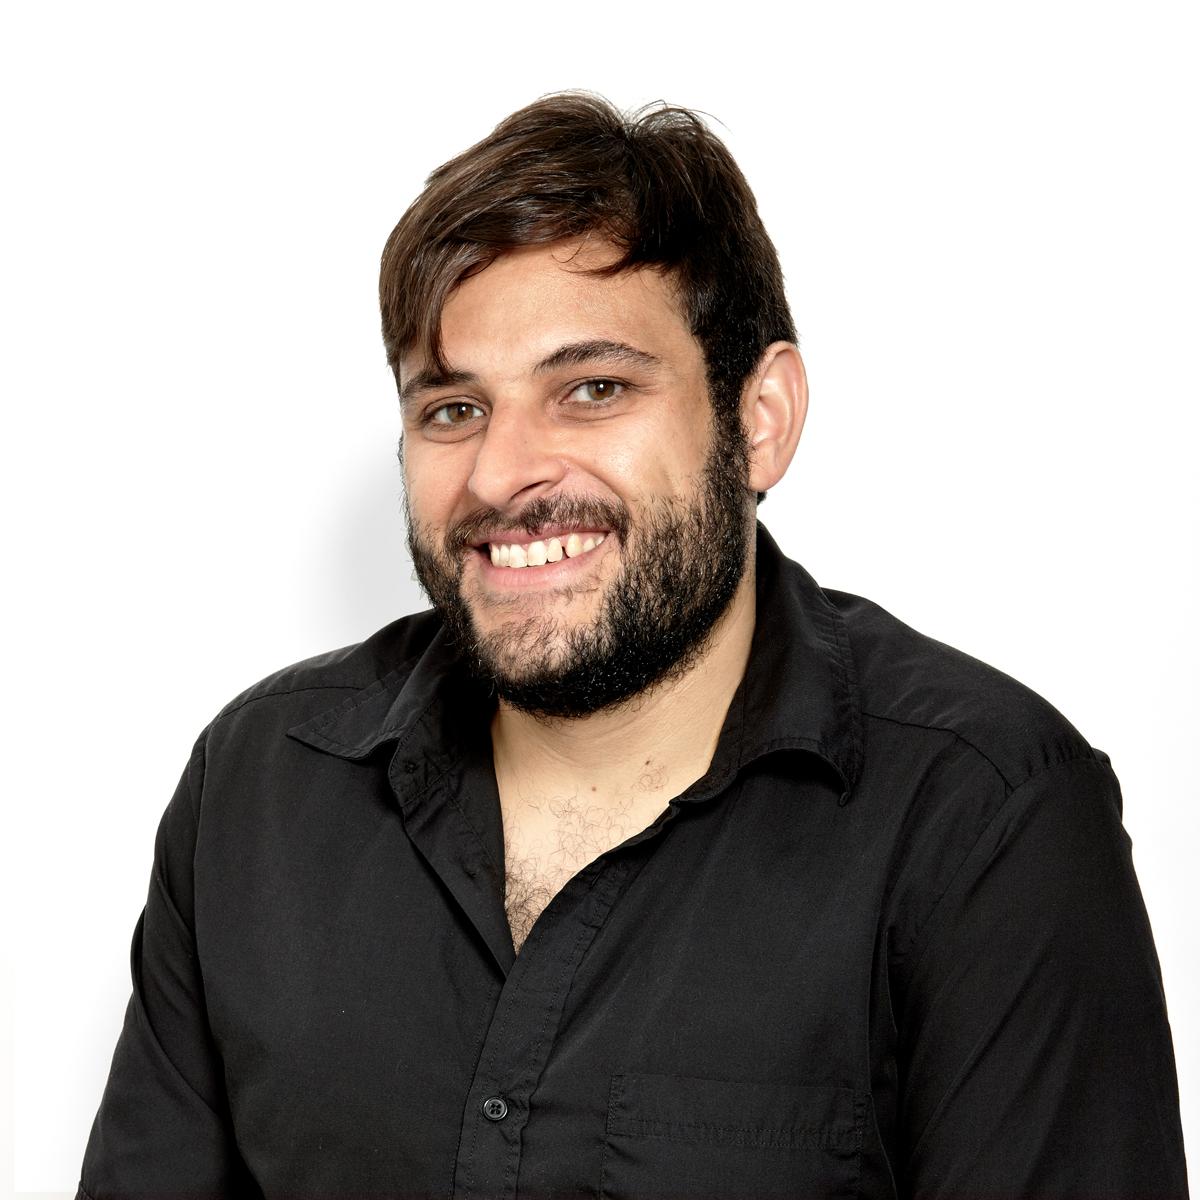 Daniel Fouad